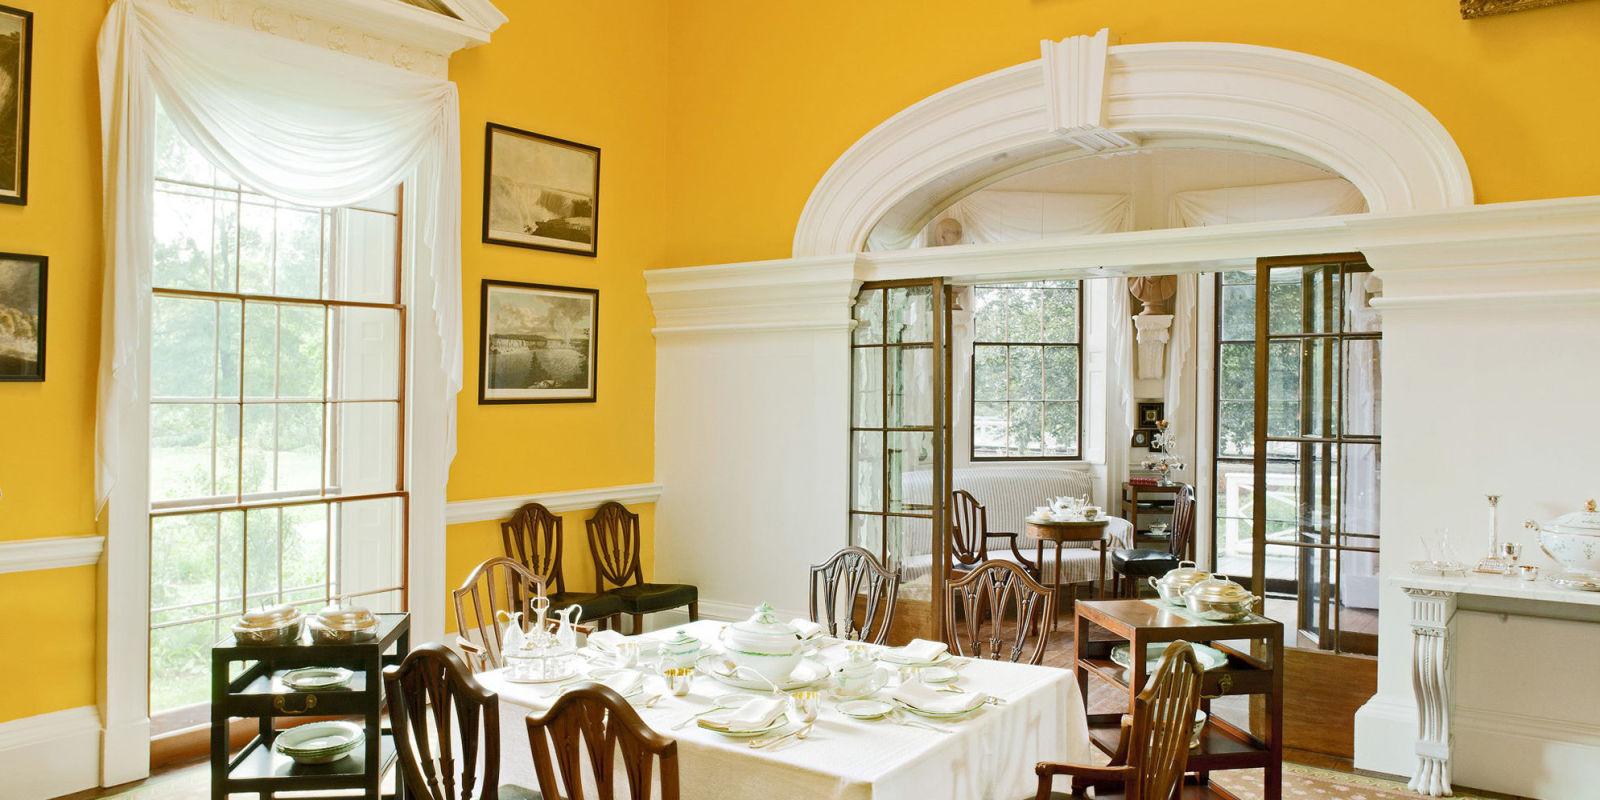 8 famous paint colors through history historic paint colors - Country home interior paint colors ...